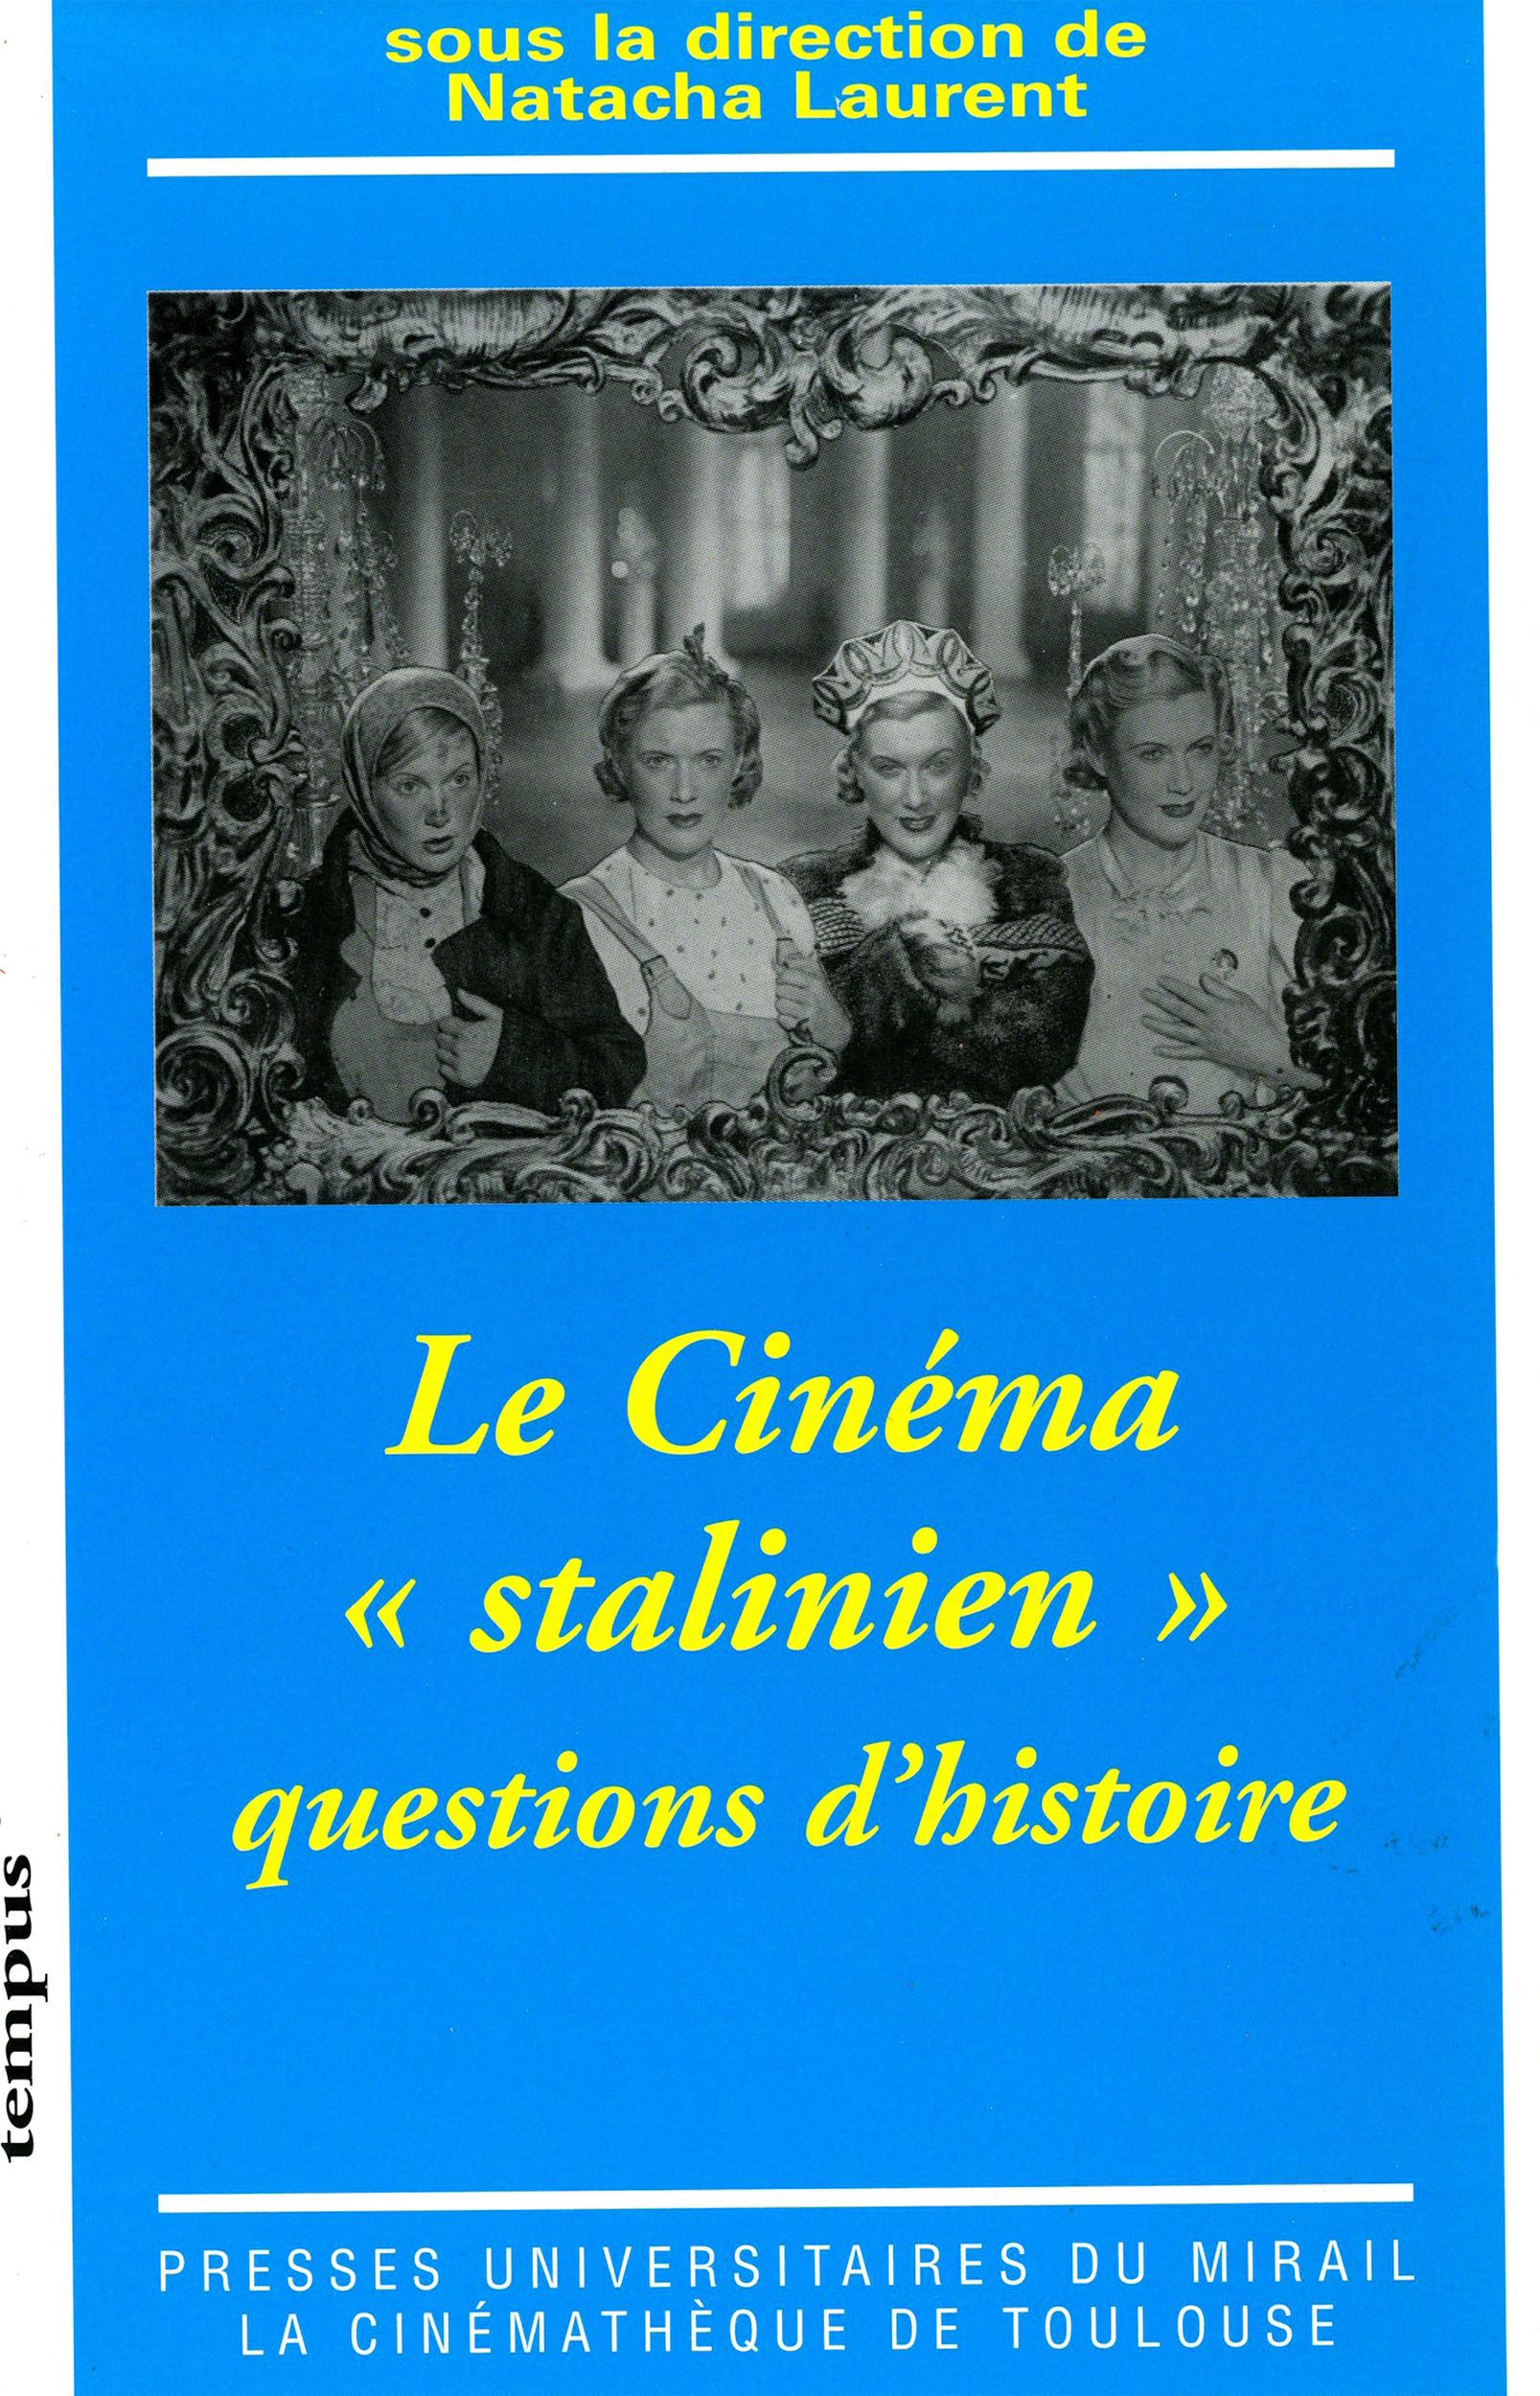 Le cinéma «stalinien»